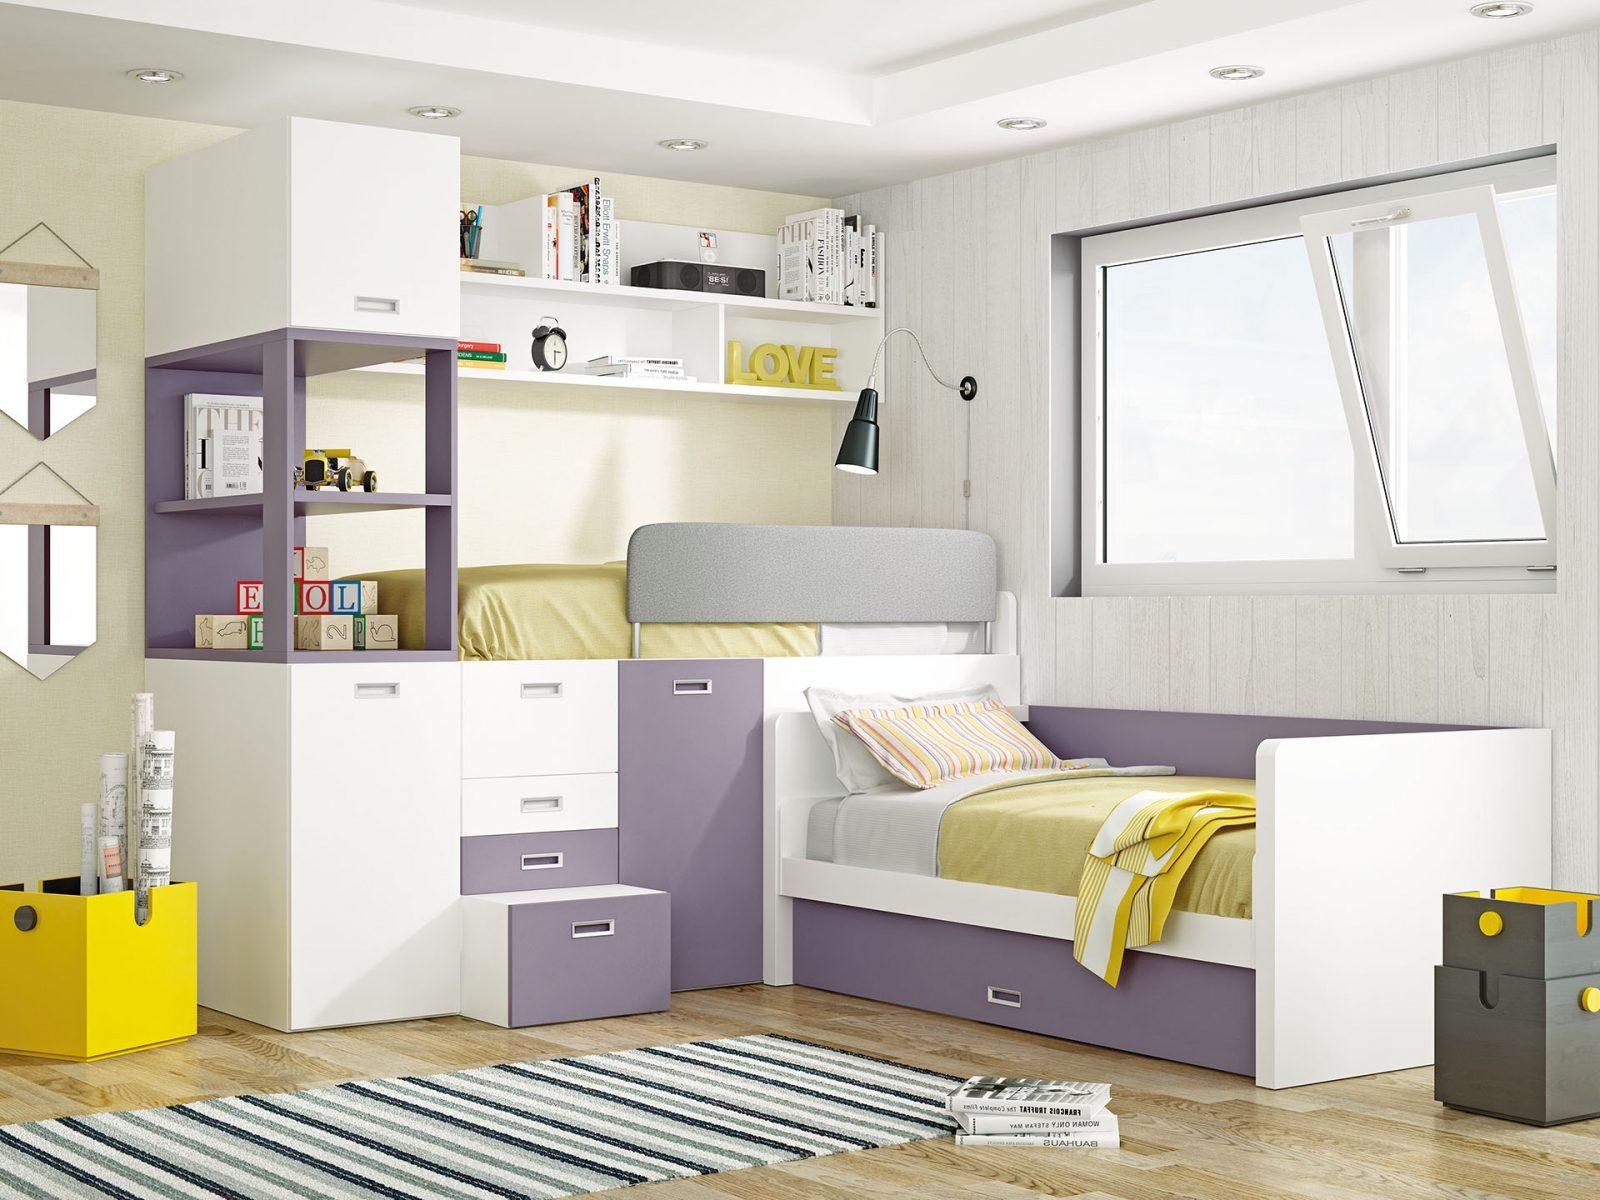 Mobiliario hd fabricaci n de muebles a medida en n jera - Mueble juvenil diseno ...